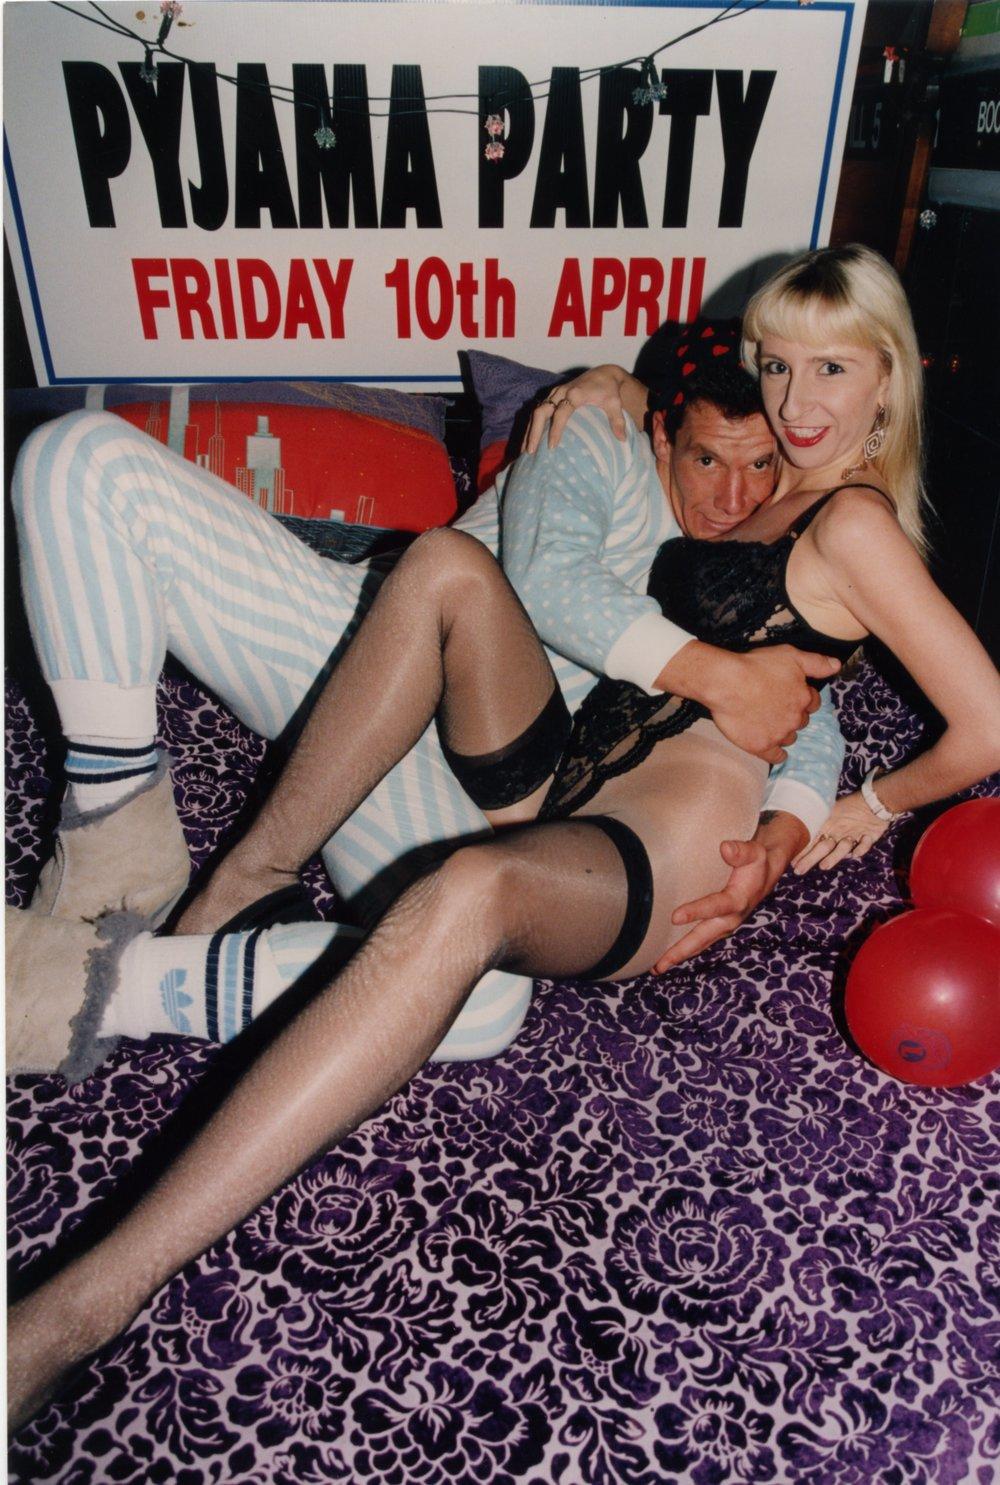 Craig Pyjama Party.jpg